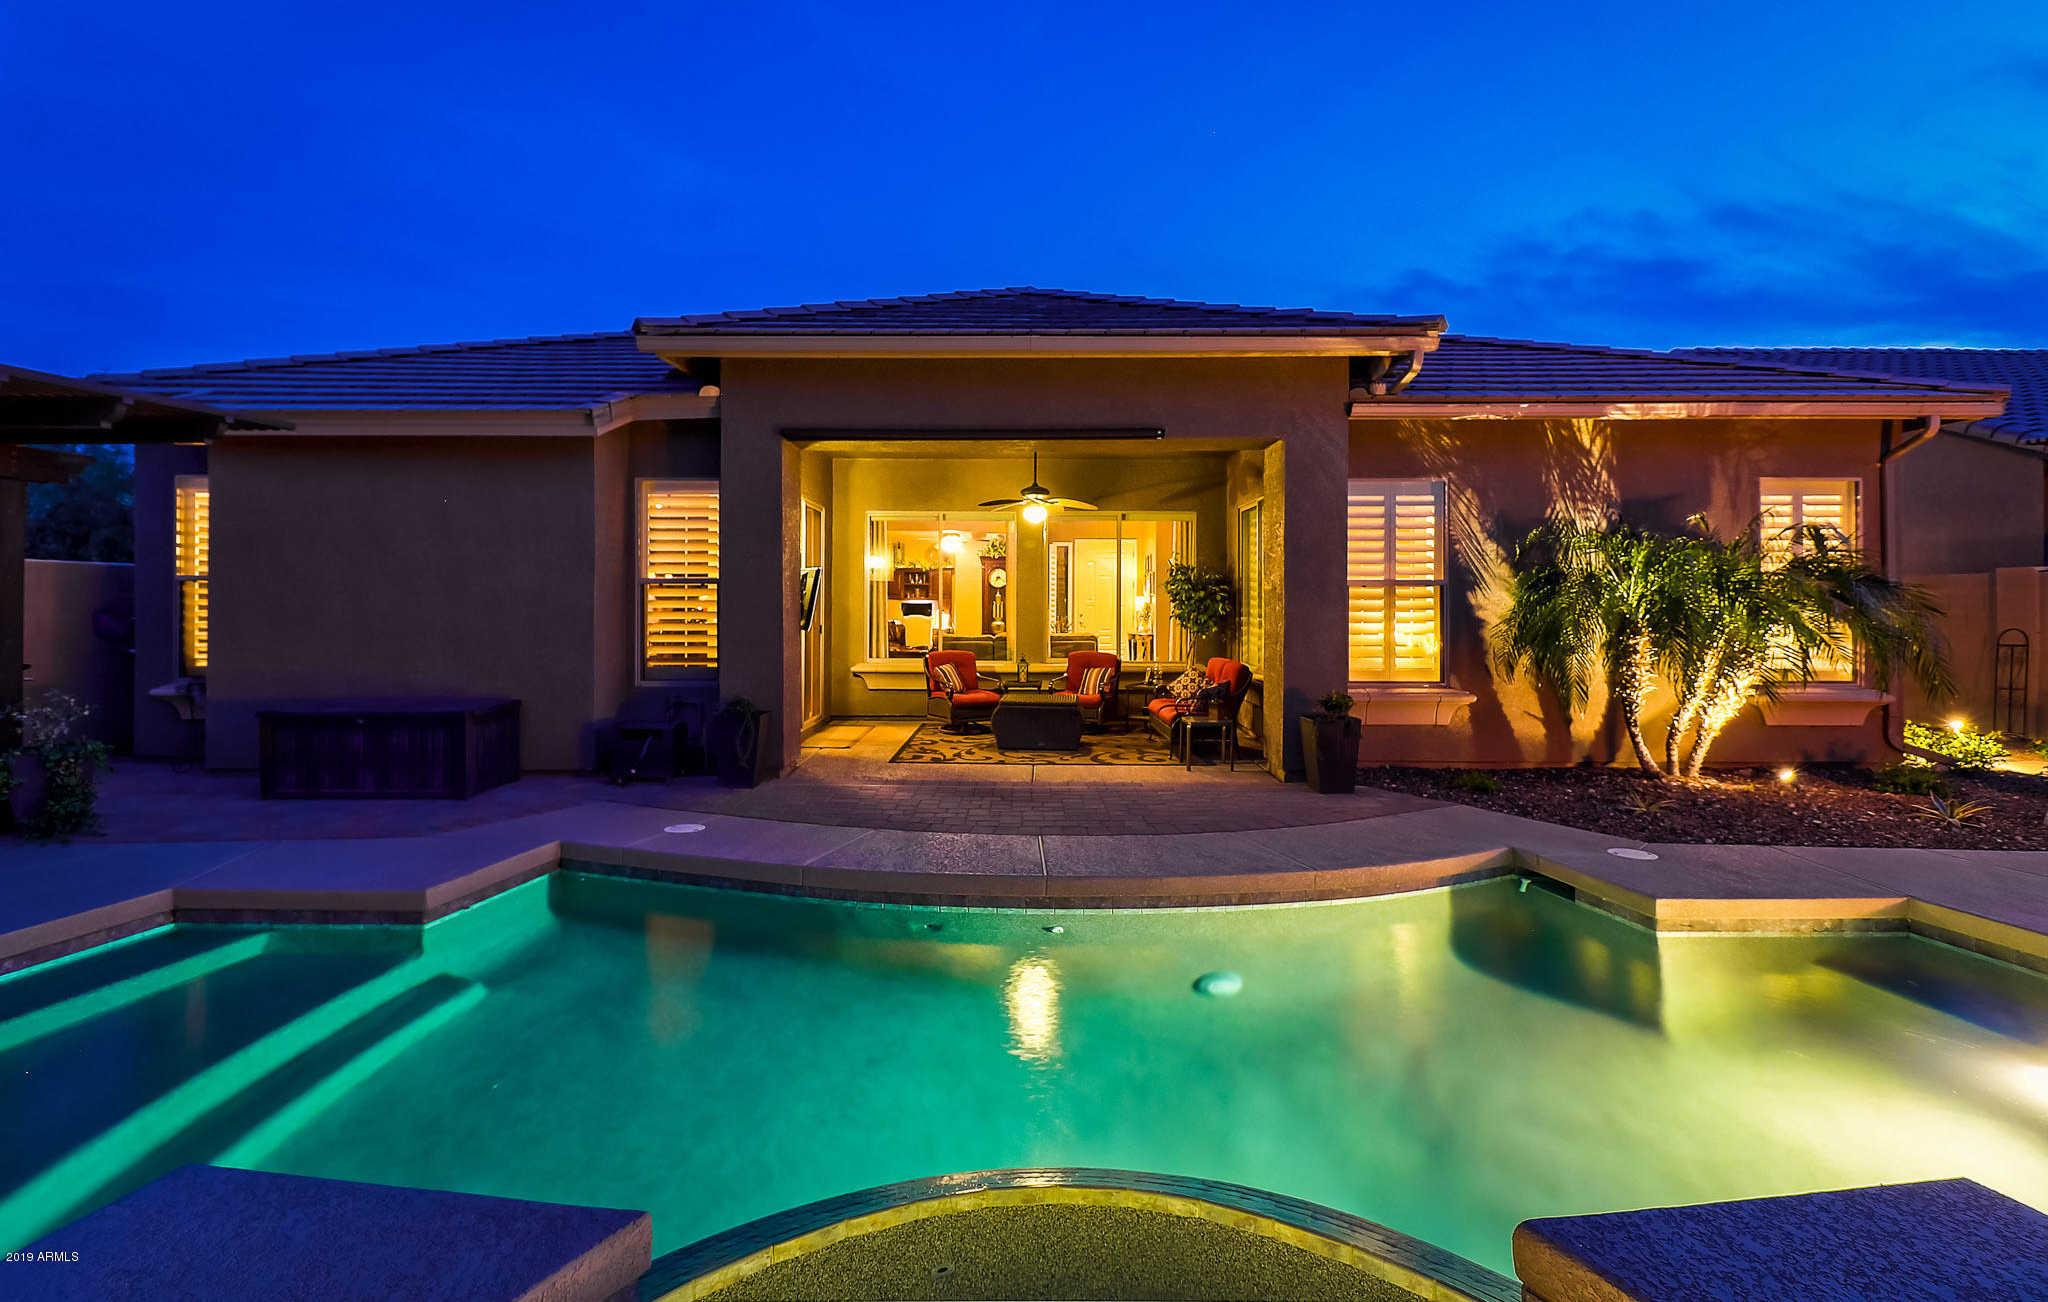 $344,900 - 3Br/2Ba - Home for Sale in Estrella Mountain Ranch Parcel 96b, Goodyear